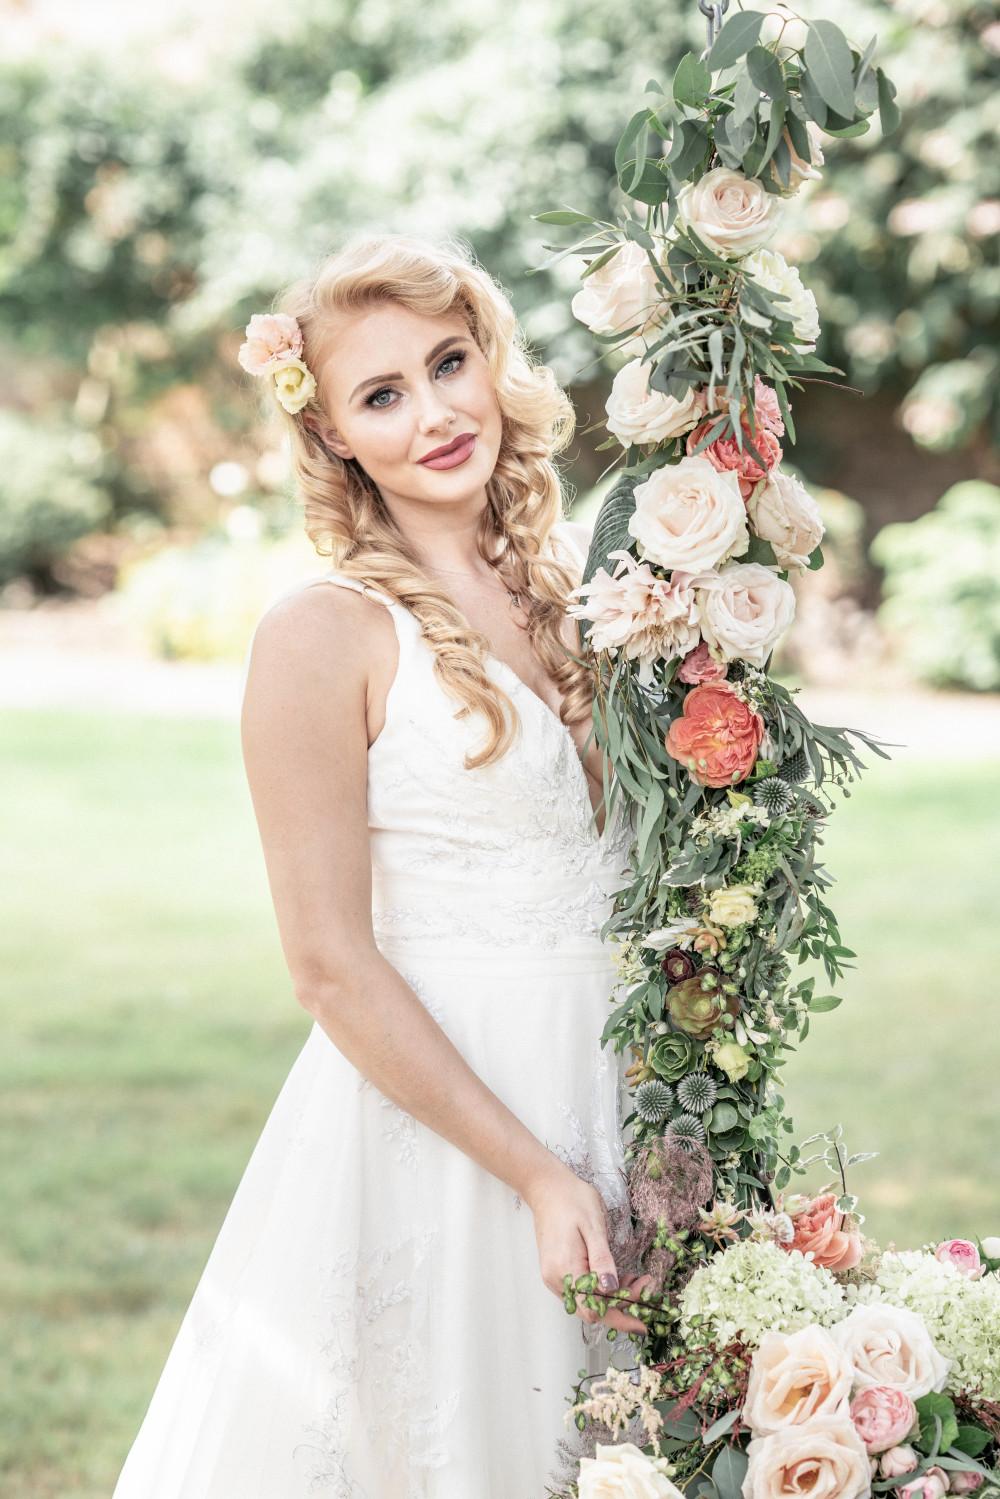 Styled Photoshoot   Inspiration - The Secret Garden - Make Me Bridal Artist: SJM Beauty | Make-up Artist. Photography by: Victoria Amrose Photography. #glamorous #boho #naturalmakeup #bridalmakeup #flowersinherhair #flowers #relaxed